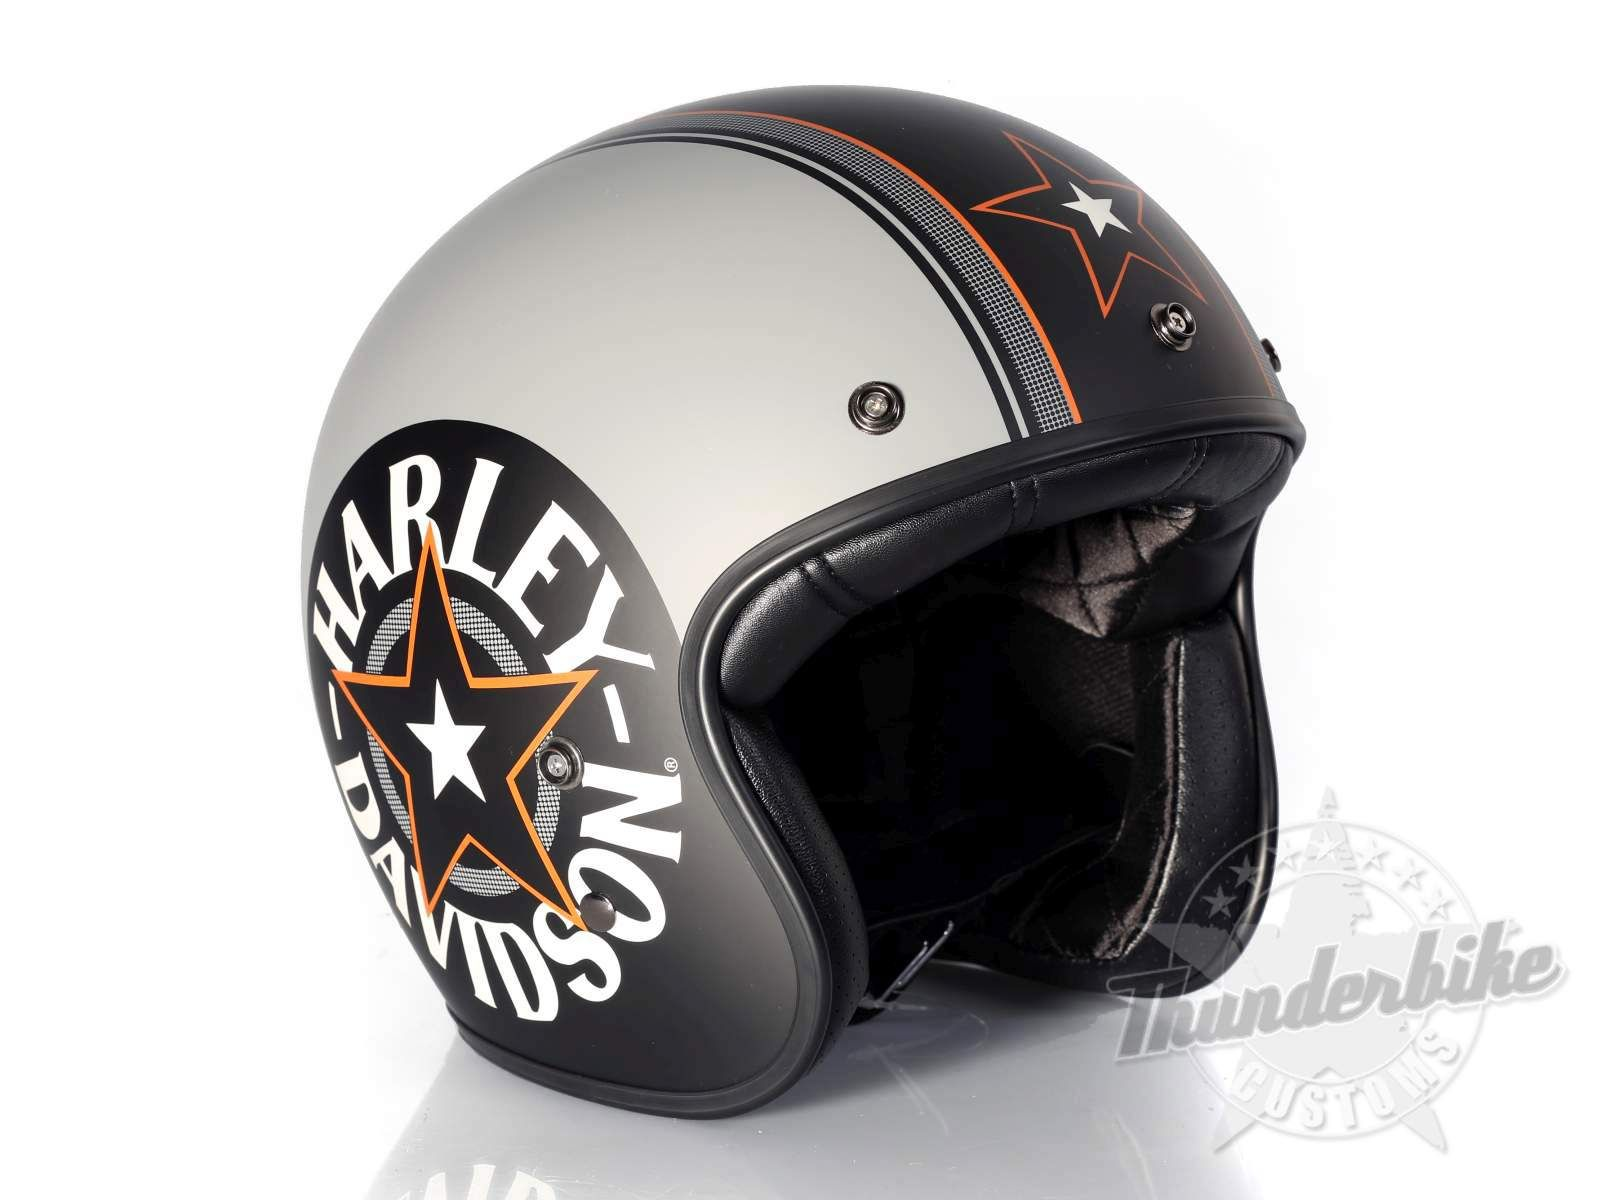 Ec 98320 15e Harley Davidson Grey Star Retro 3 4